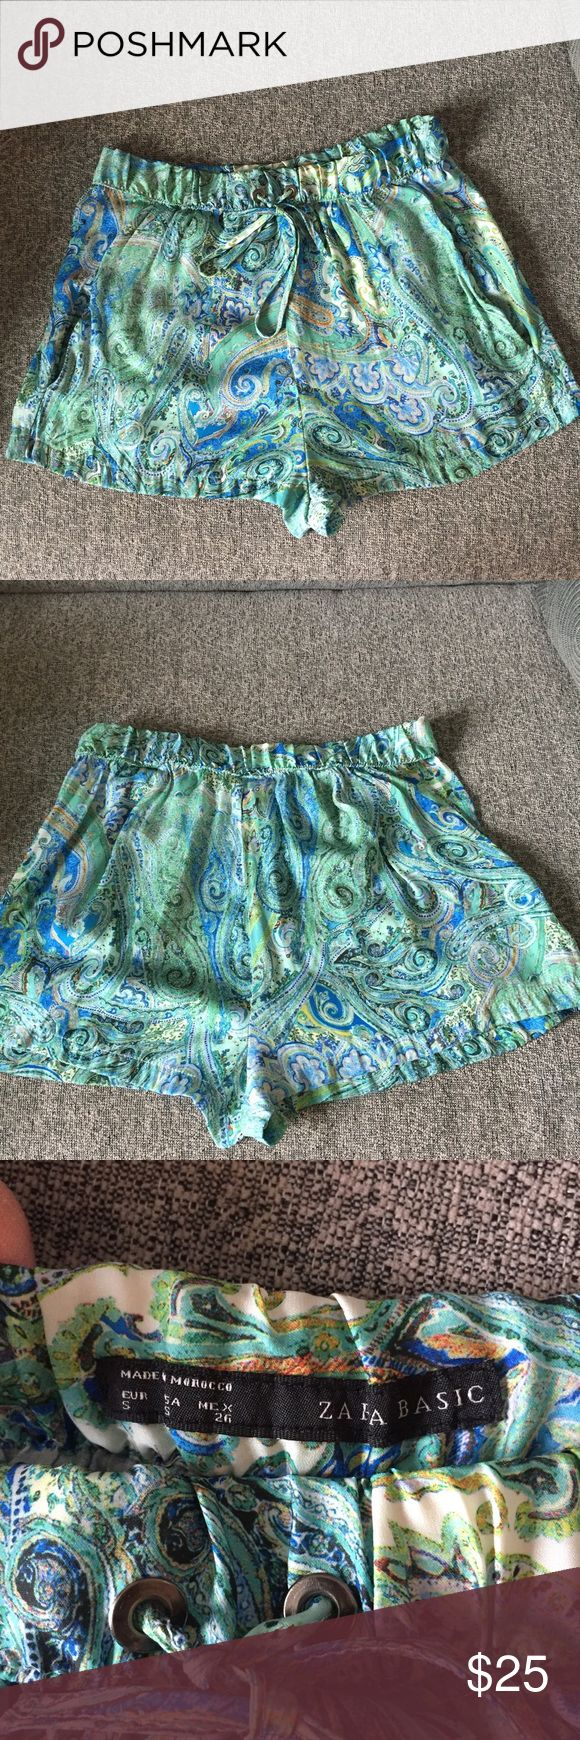 Zara basic shorts Sz S Pre owned Zara Shorts